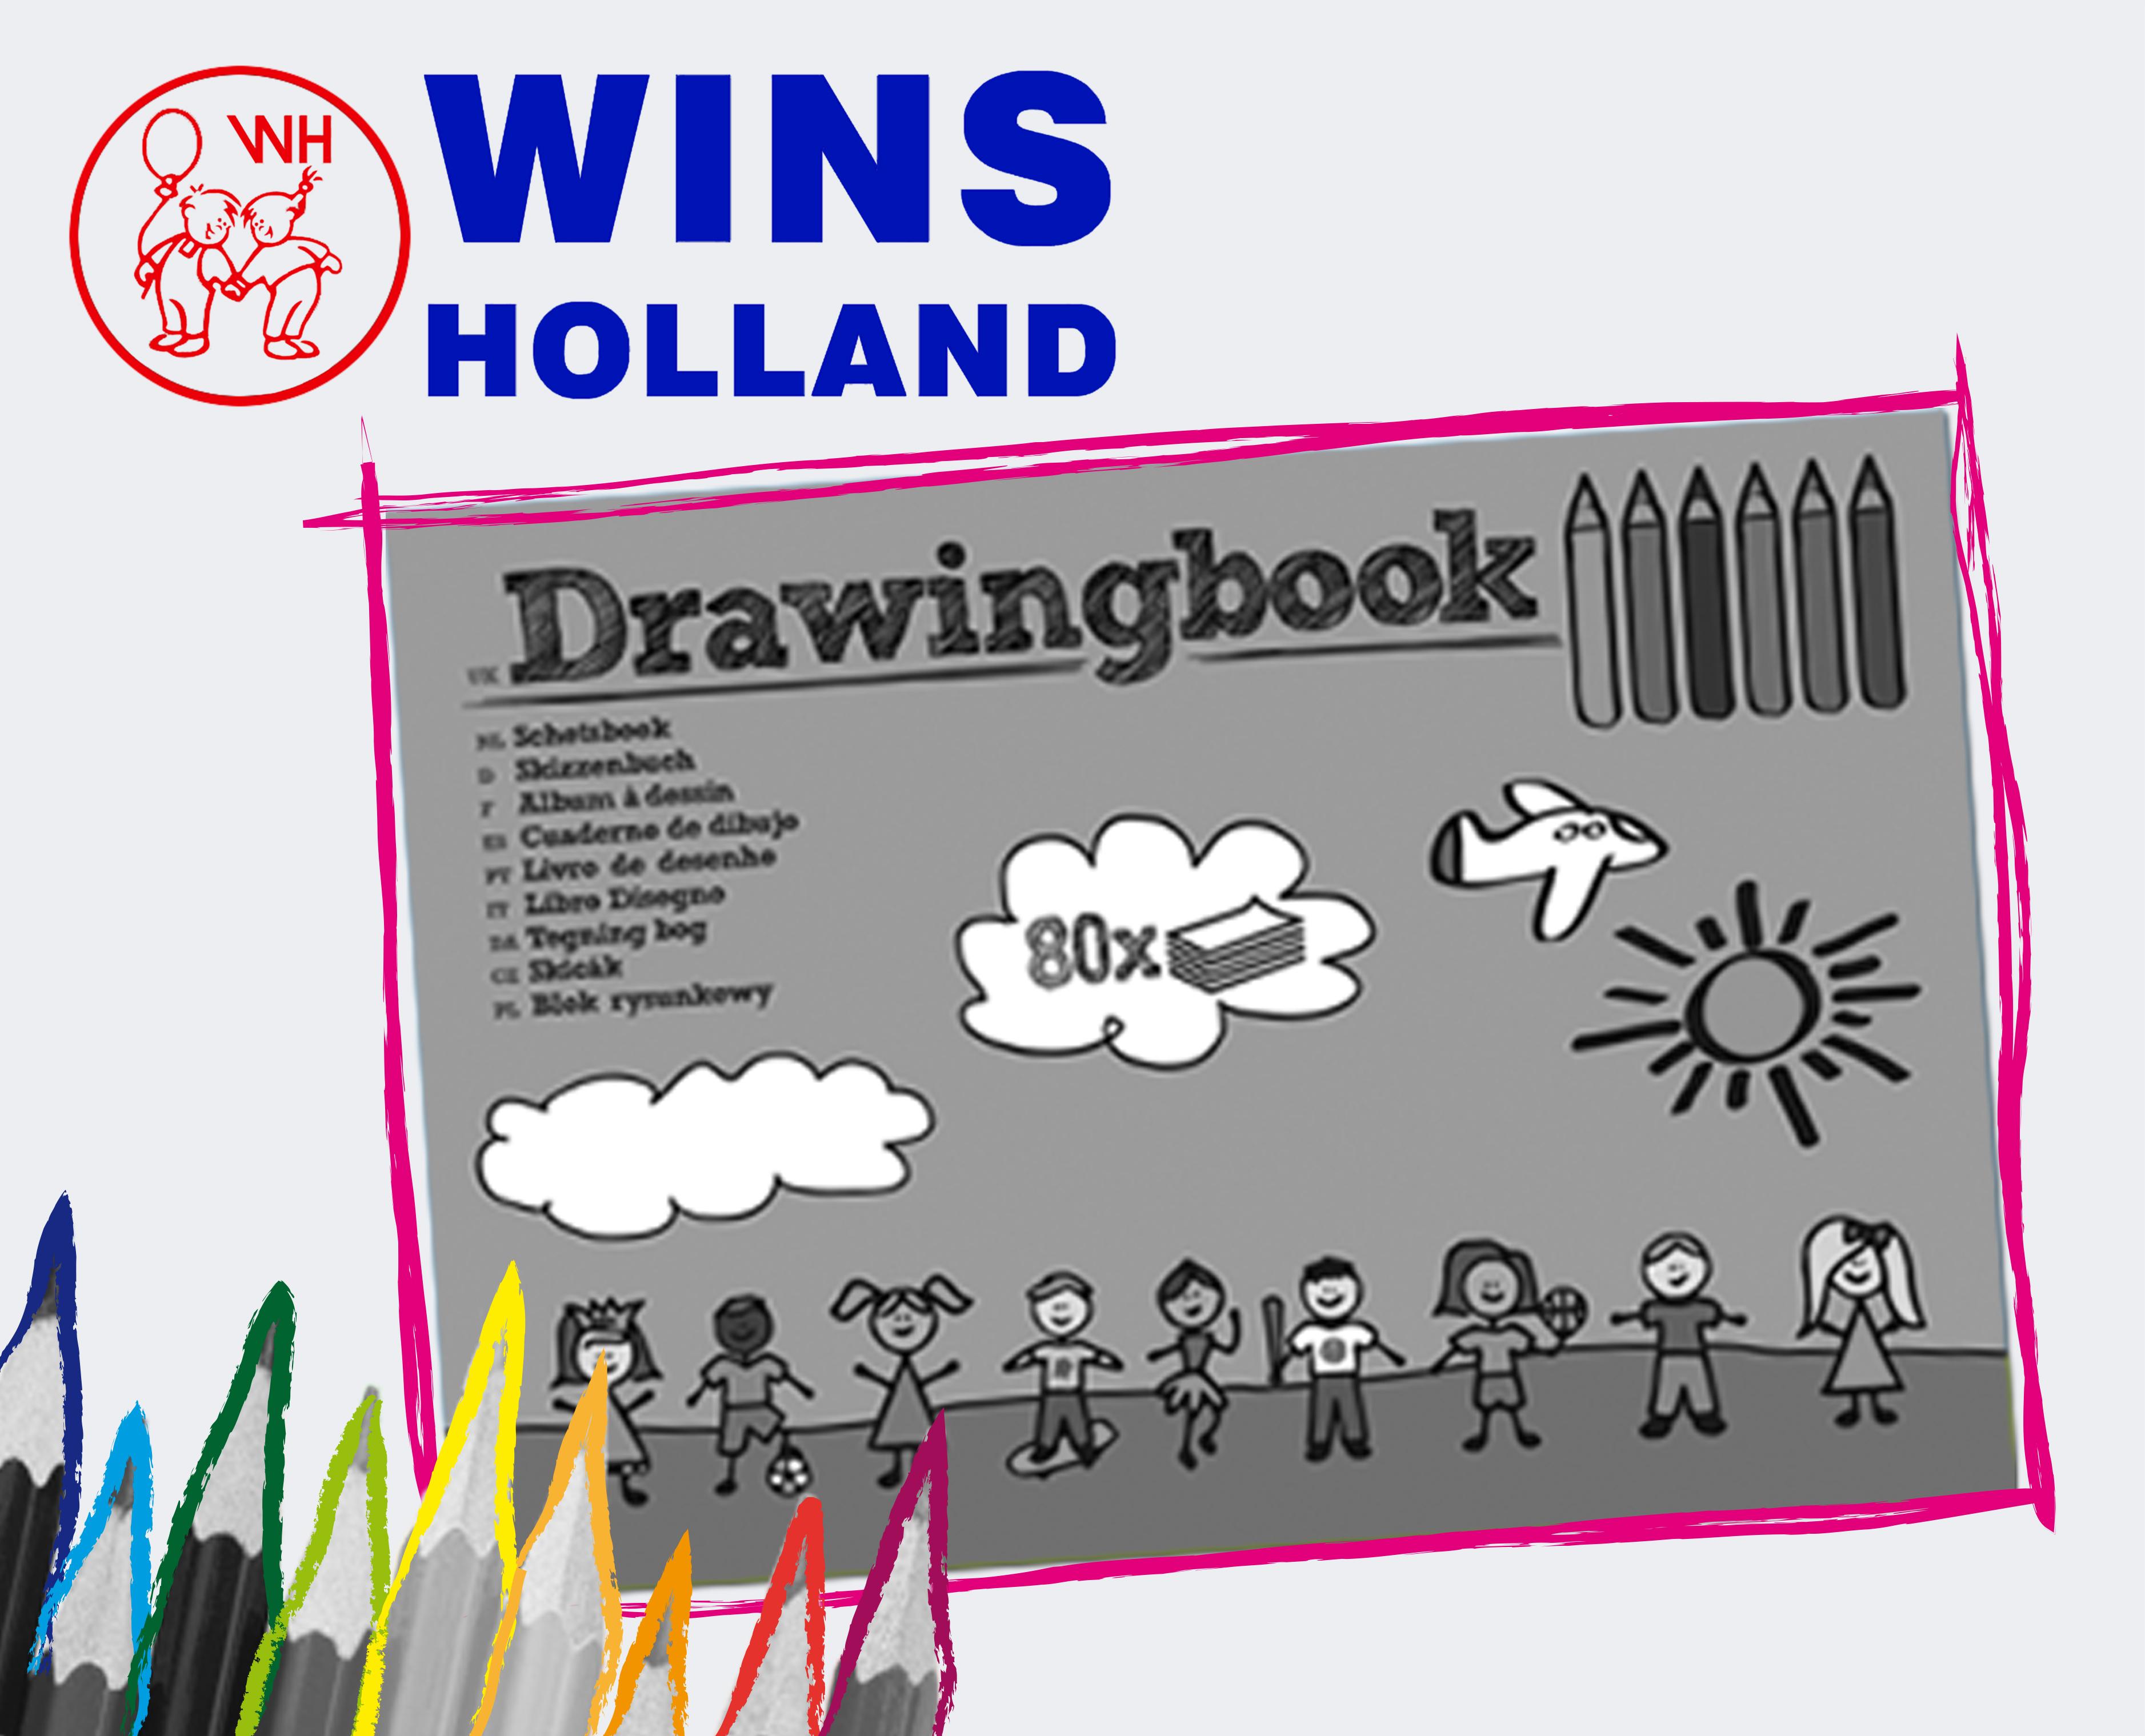 drawingbook_merk